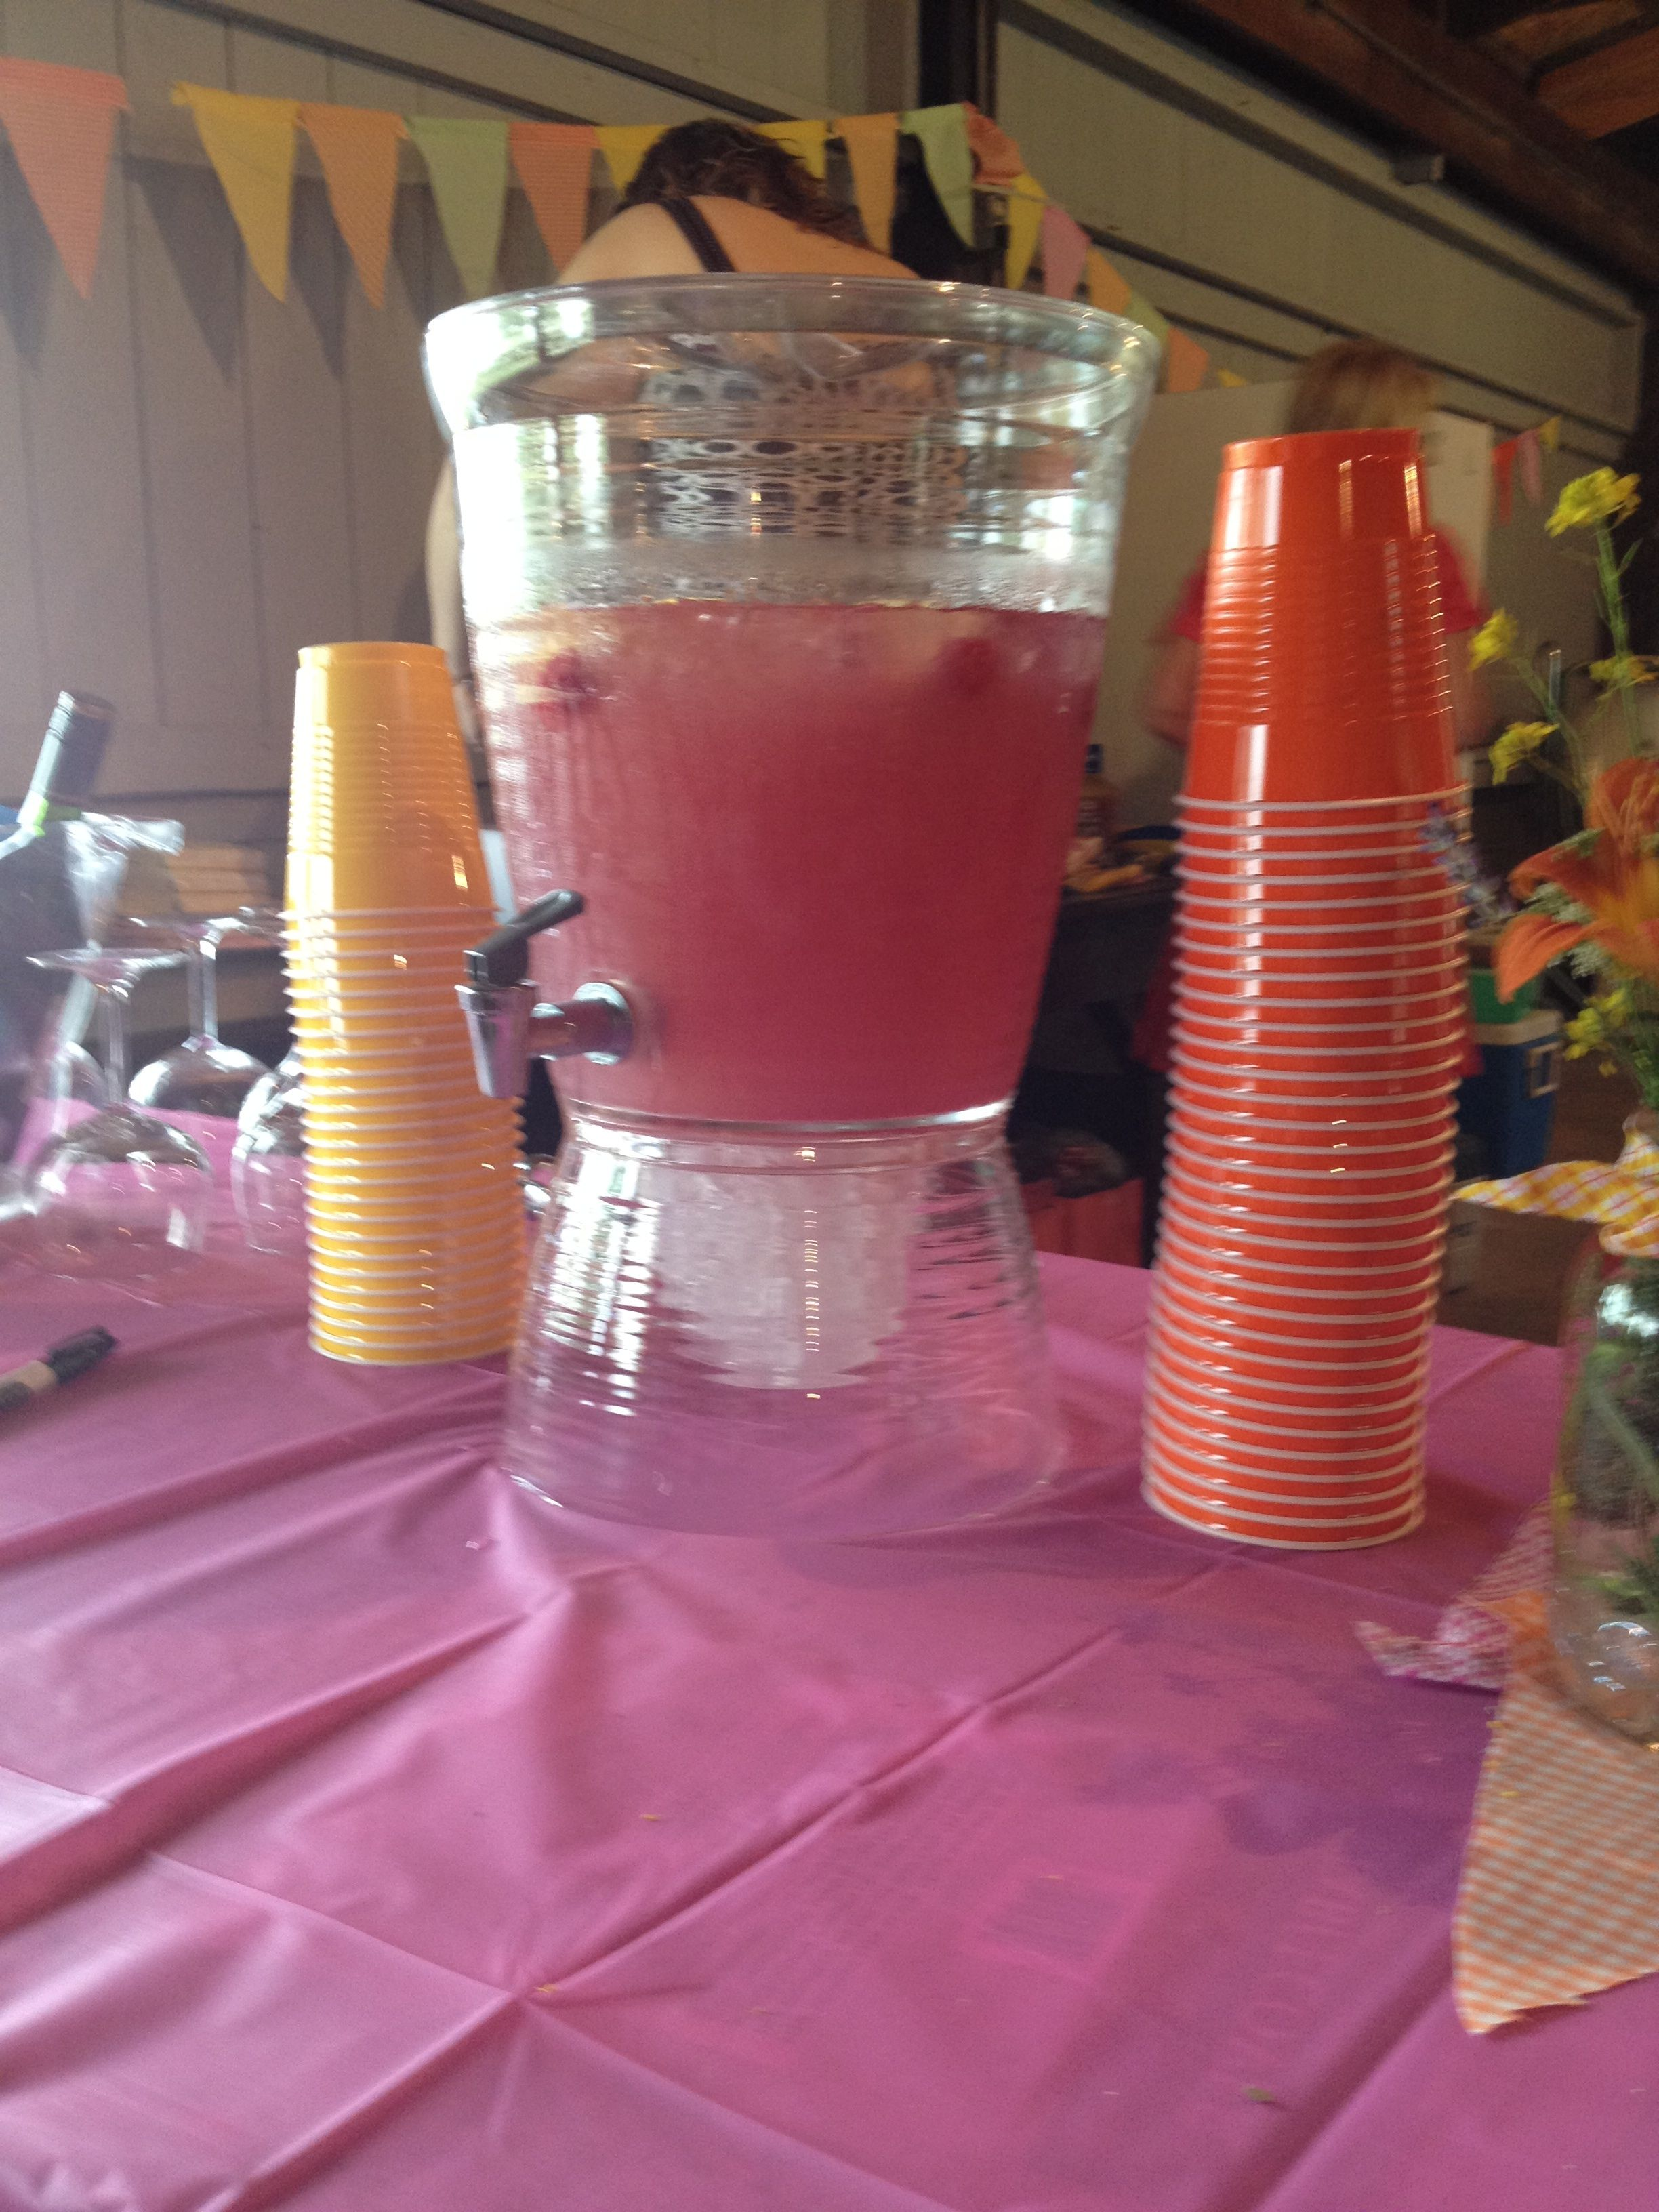 Raspberry lemonade with some raspberry vodka as the